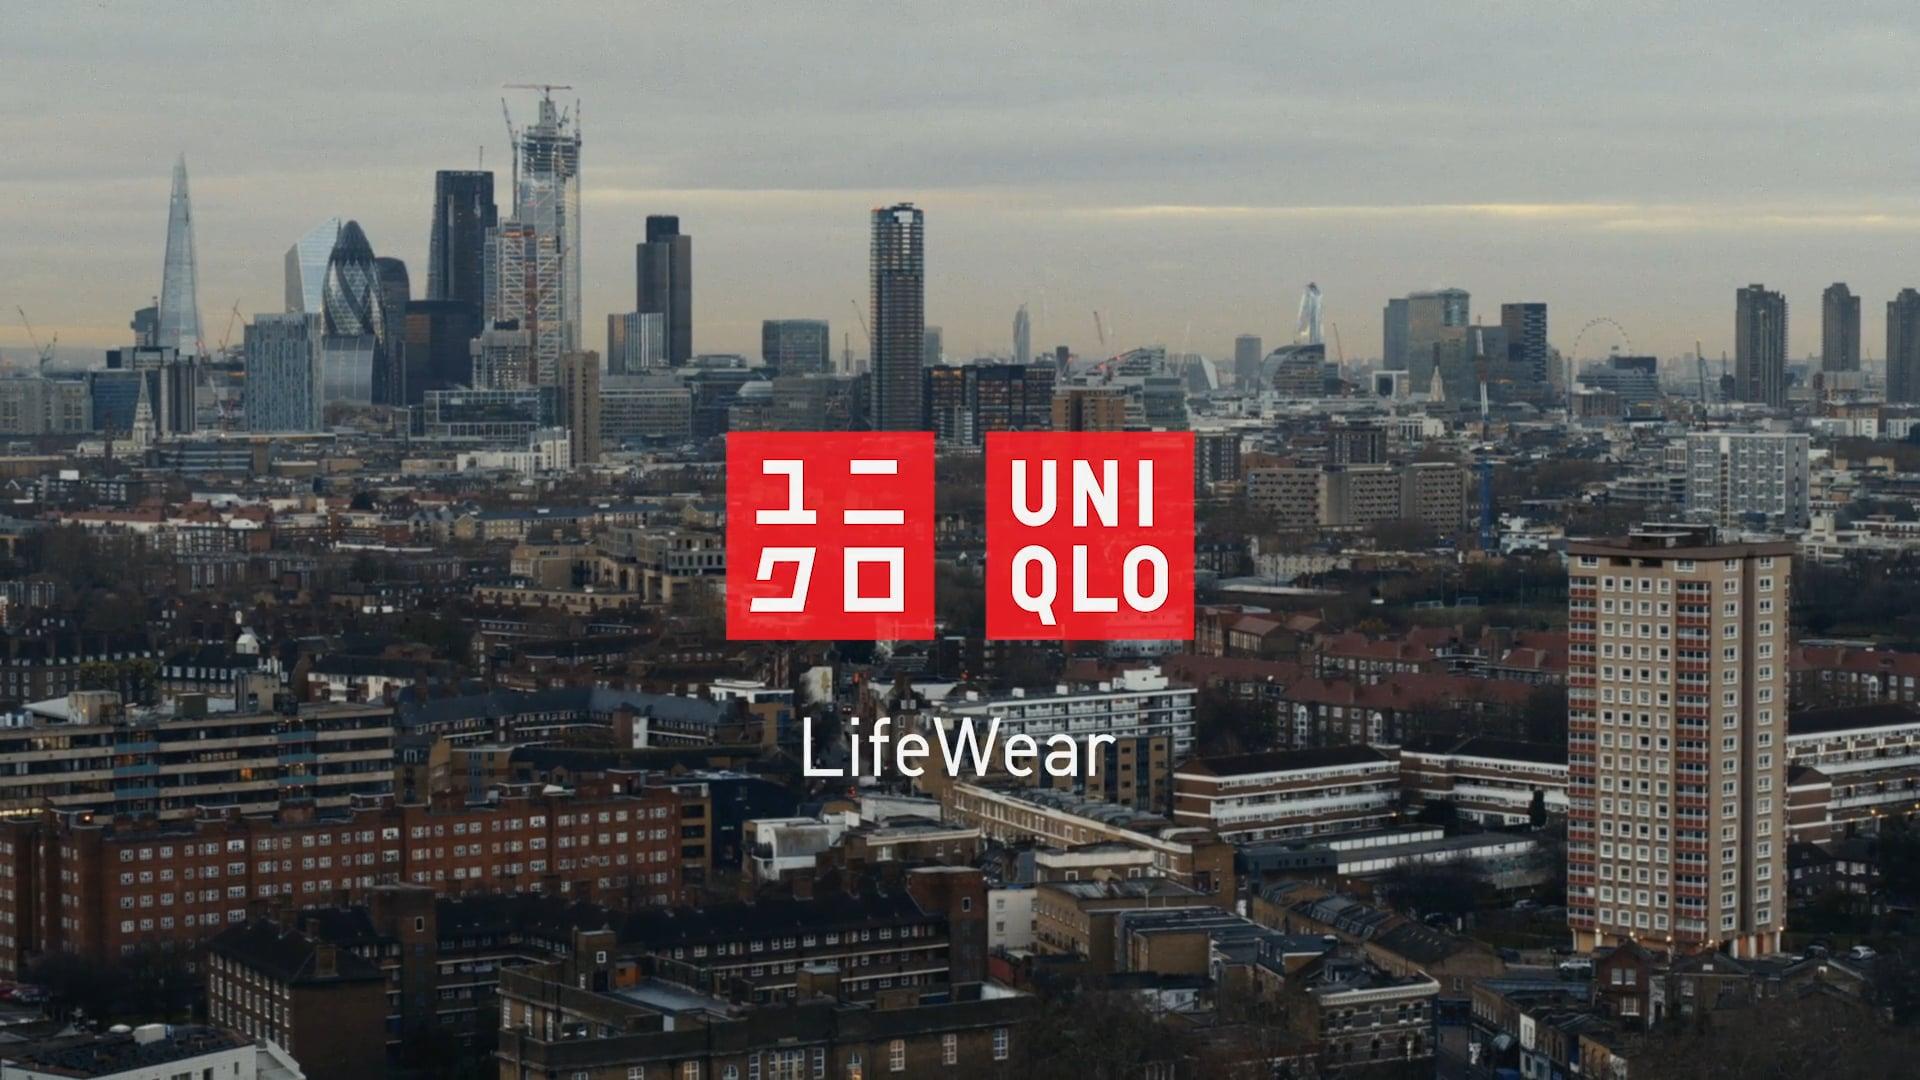 Uniqlo – London's morning warm up